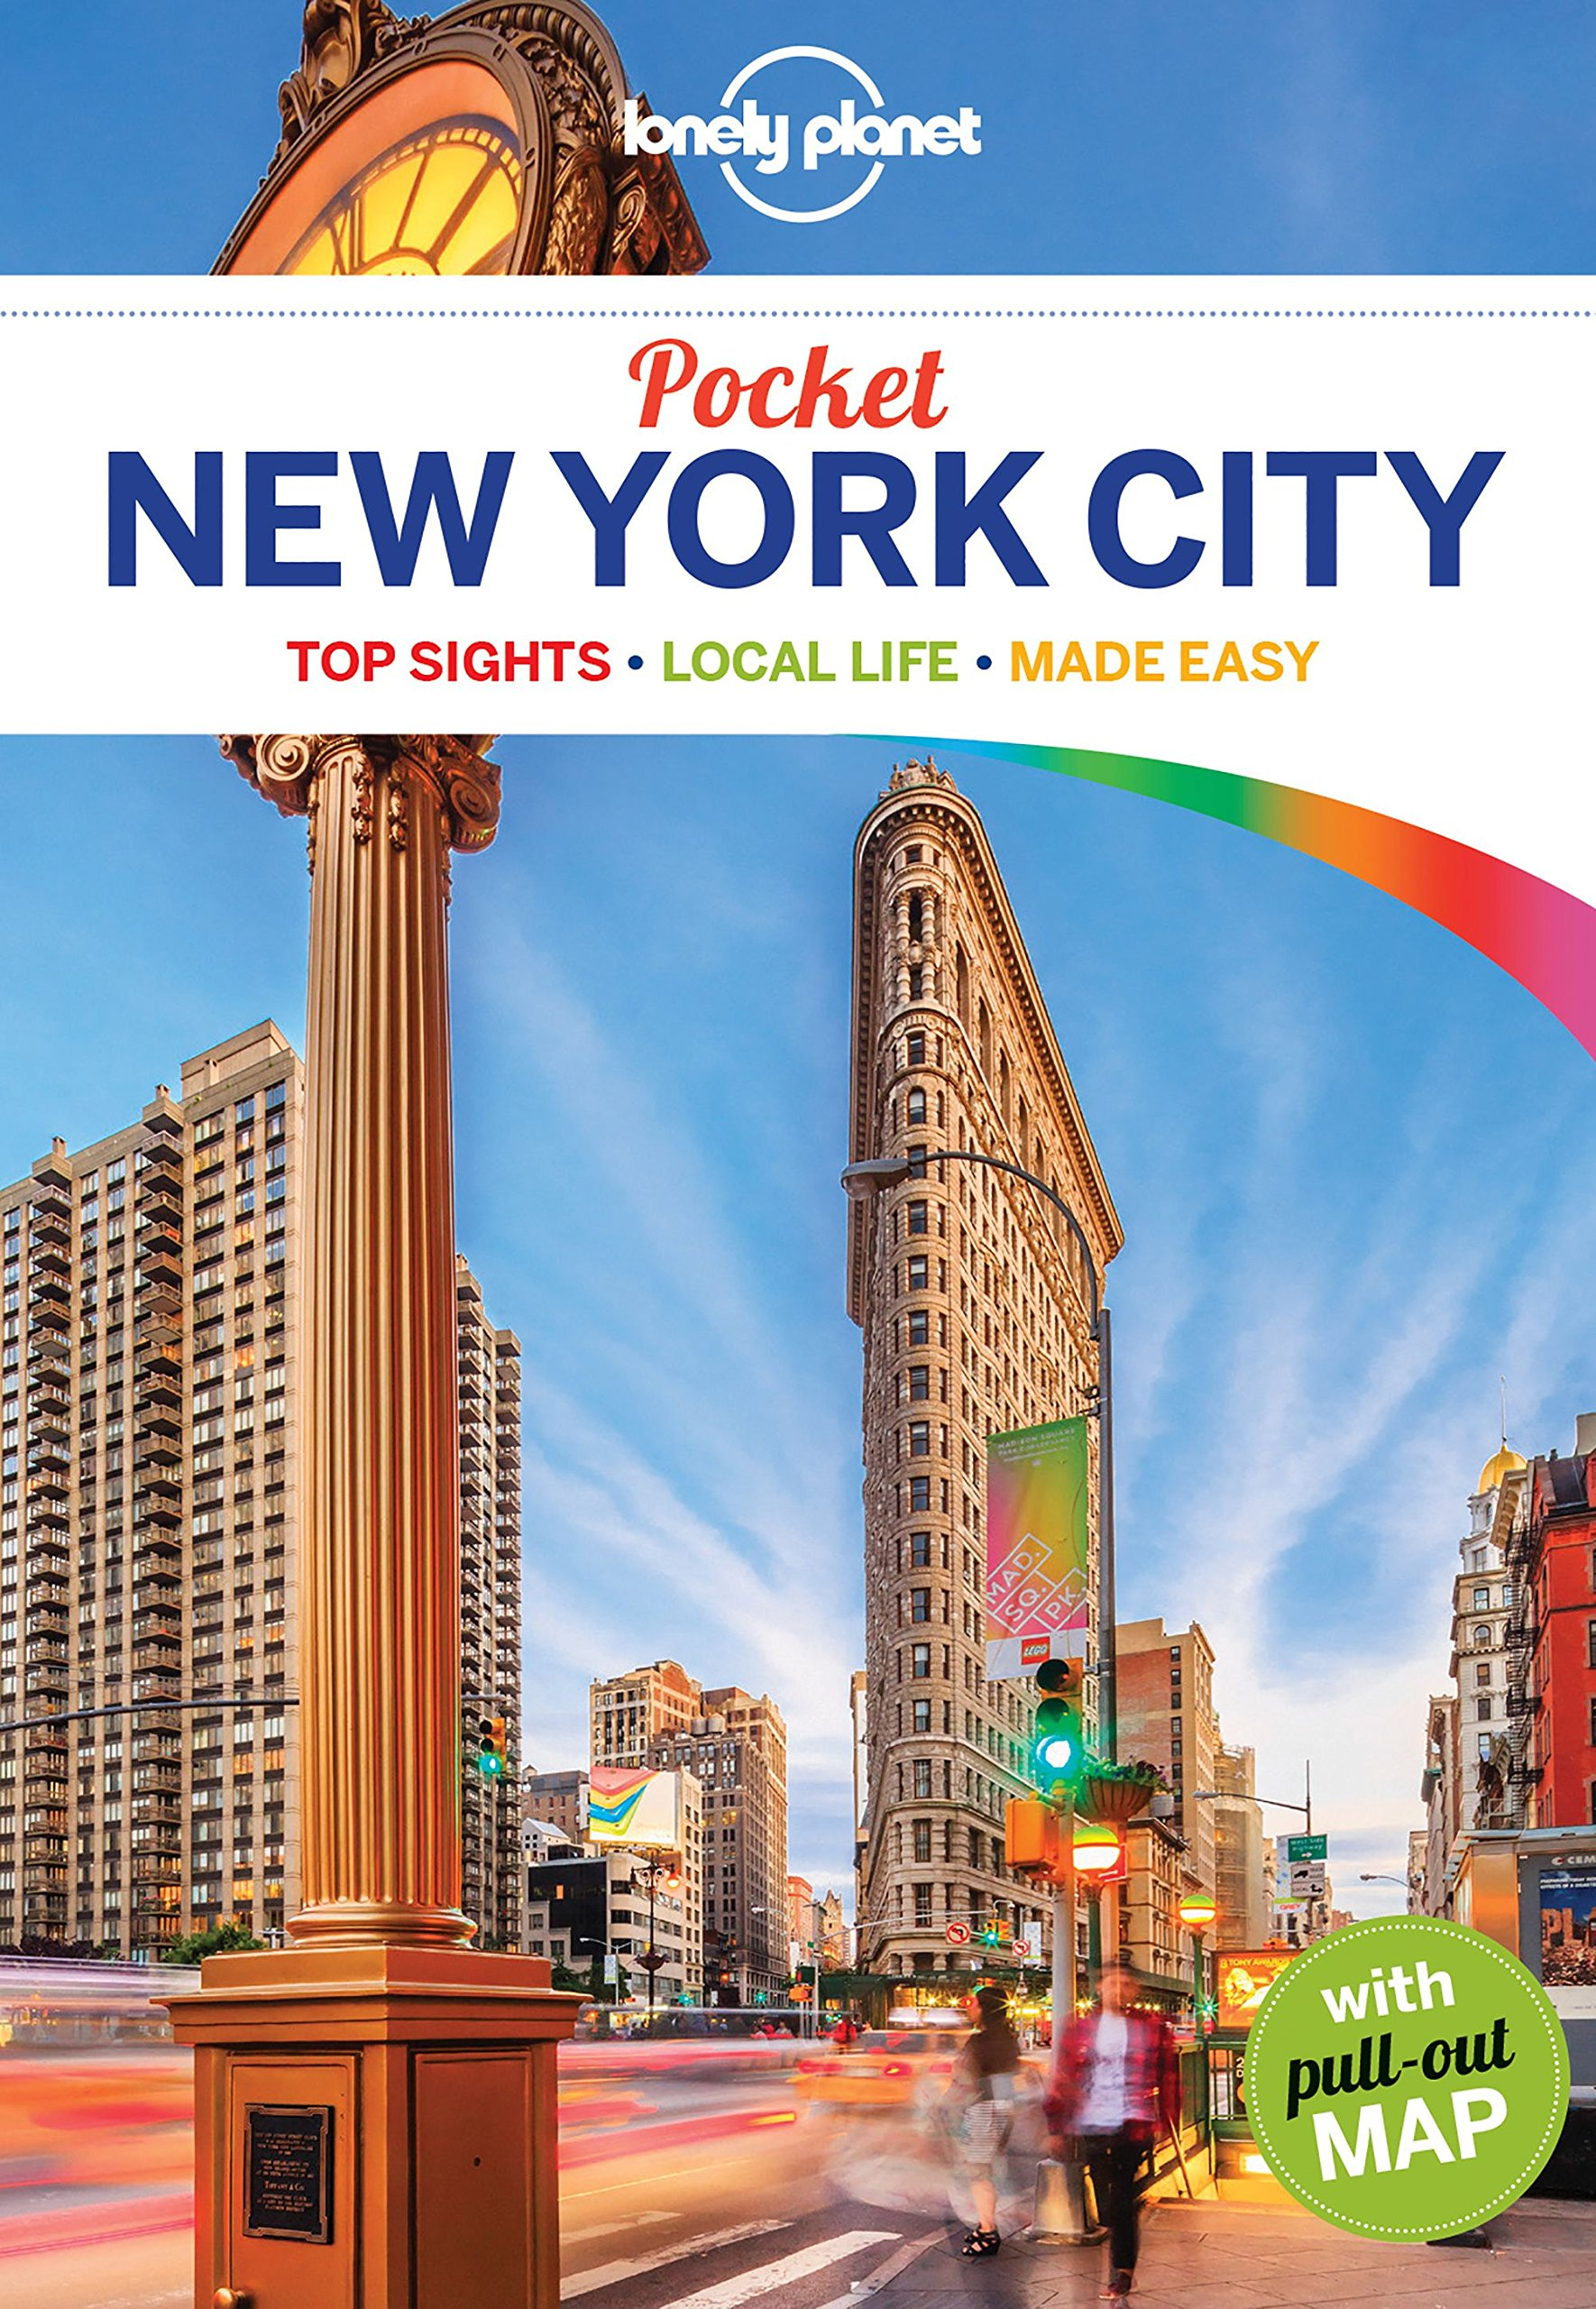 Pocket Guide New York City (Pocket Guides)